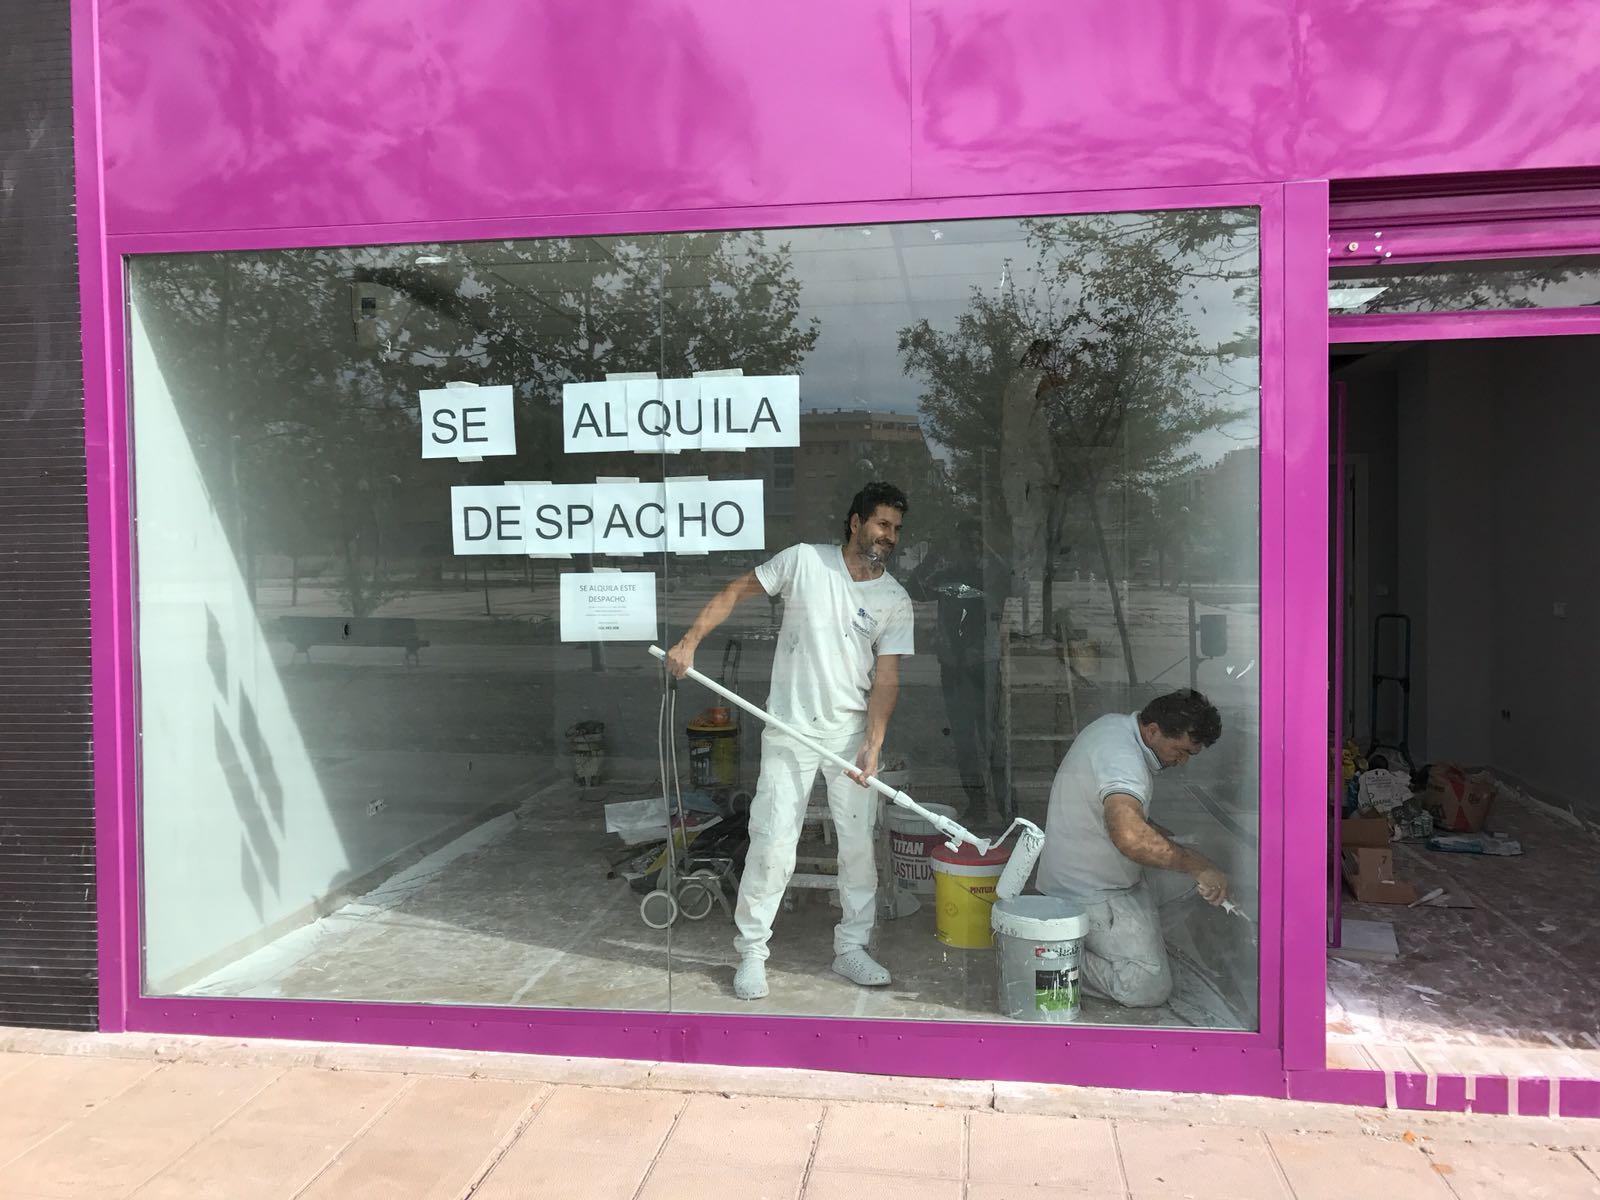 Pintores Madrid Tlf:692.734.224 ECONOMICOS